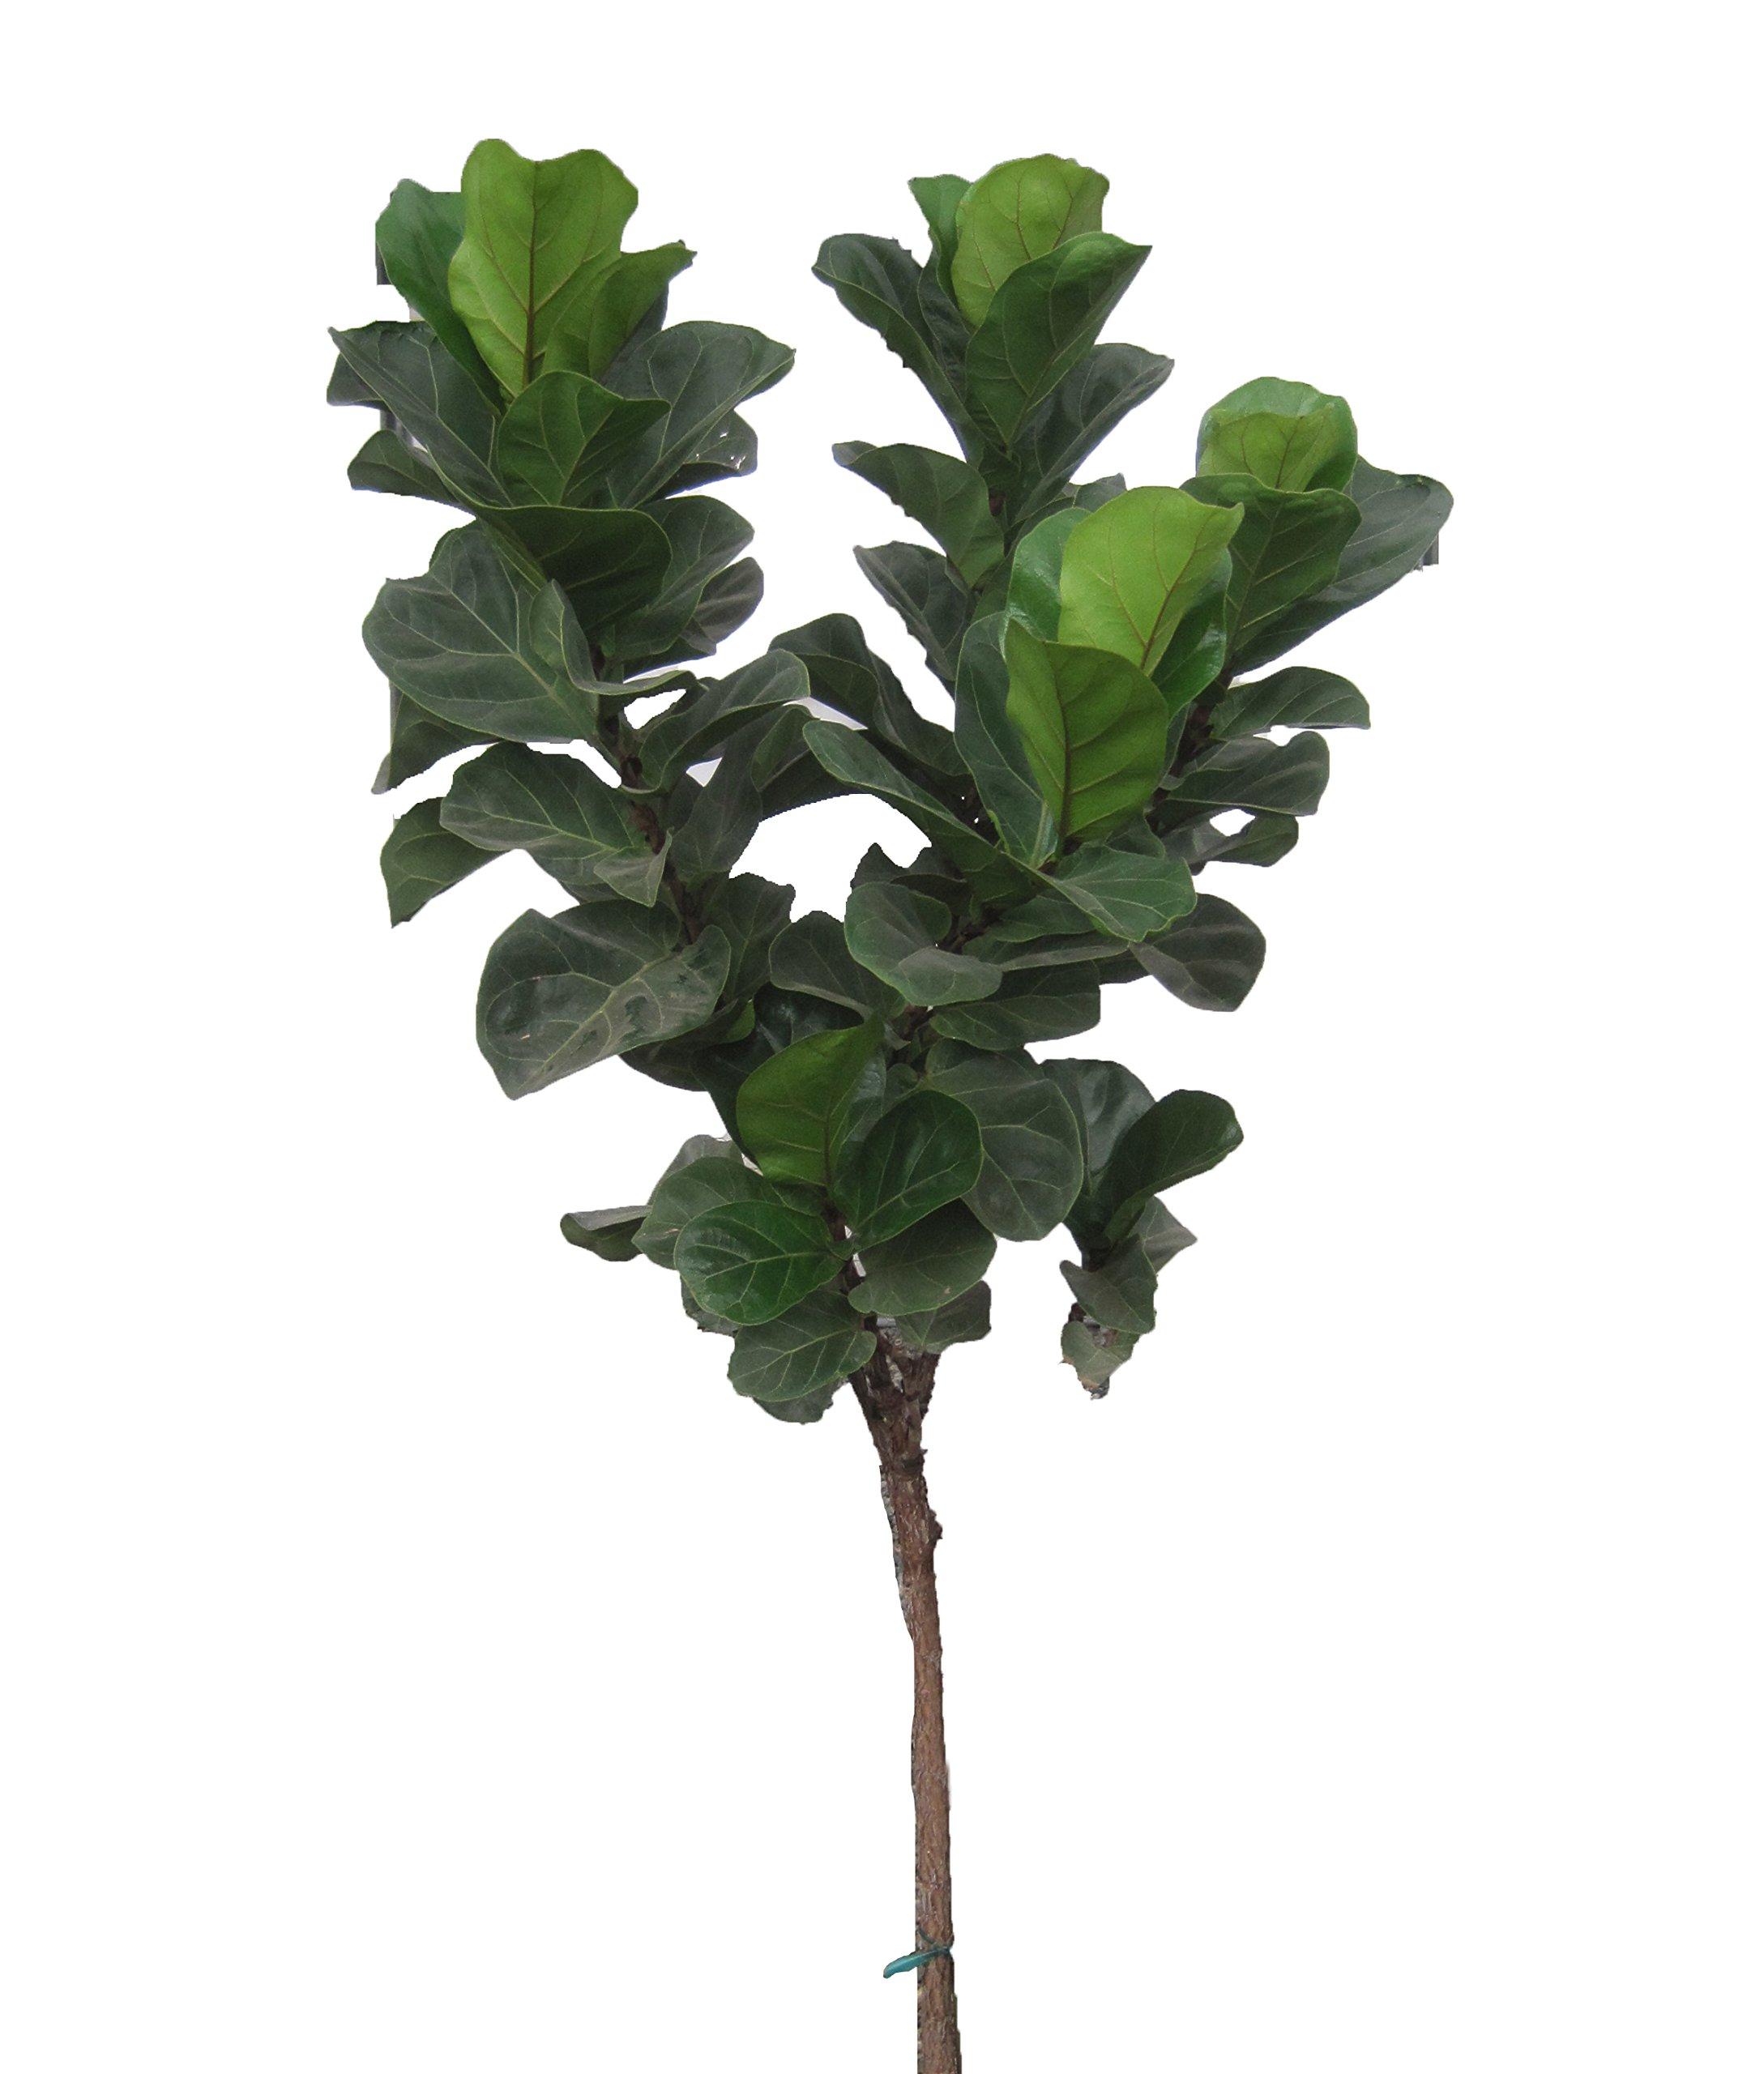 Little Fiddle Fig Standard (Ficus lyrata), 3-4' Tall